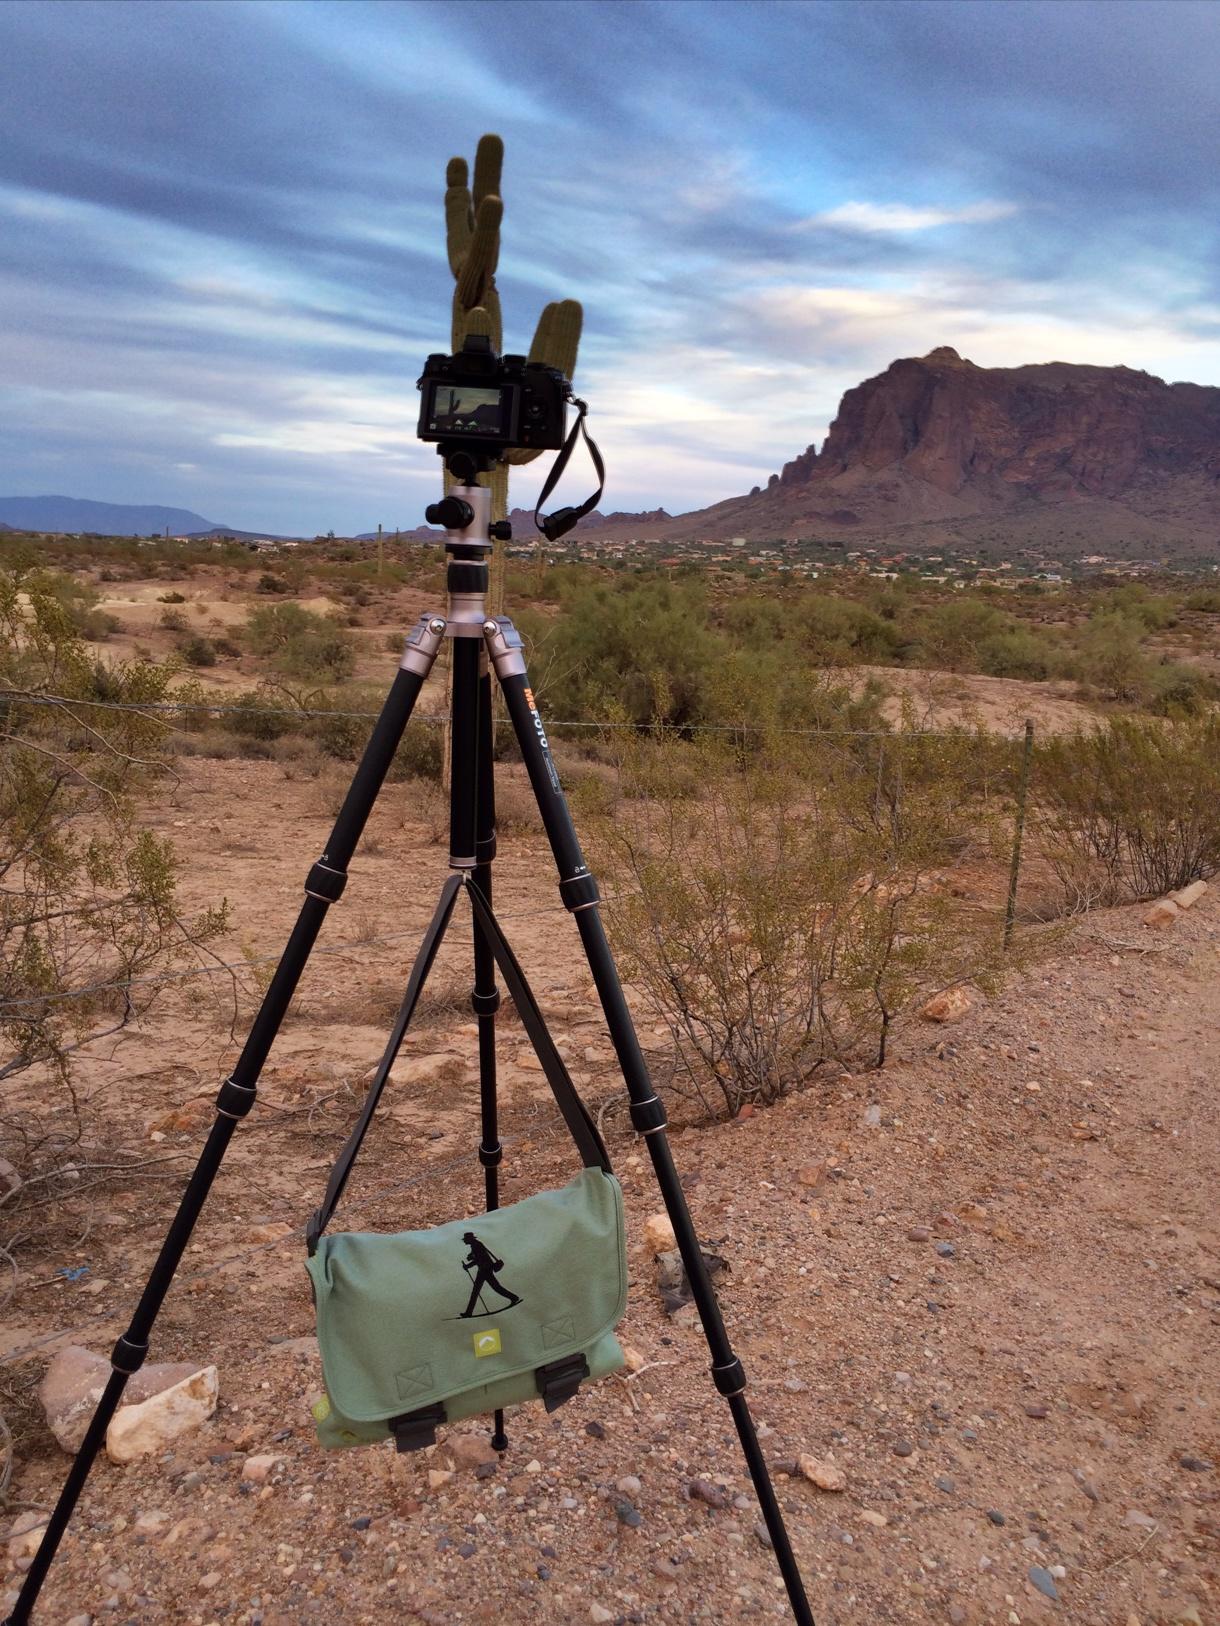 Mike Boening's Walking Man Shoulder Bag in Arizona.